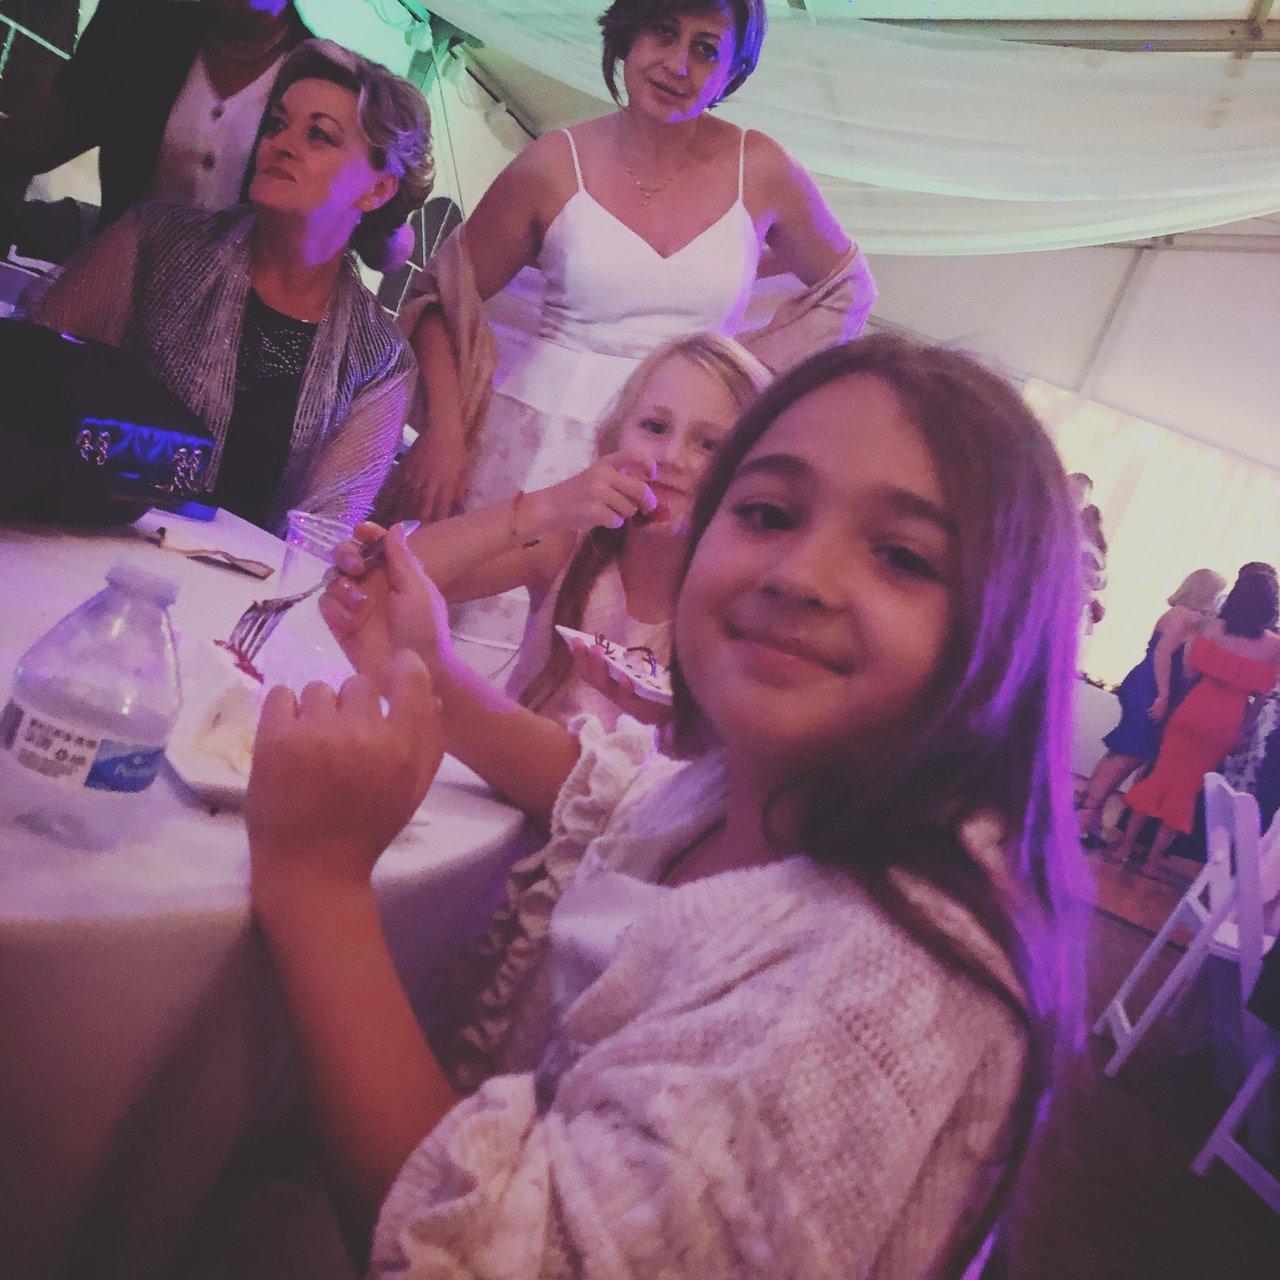 Leyjla and John Wedding—#LCJB2019 photo 92D17F6B-25C6-4EE7-9E87-1C7B317B80C2.jpg